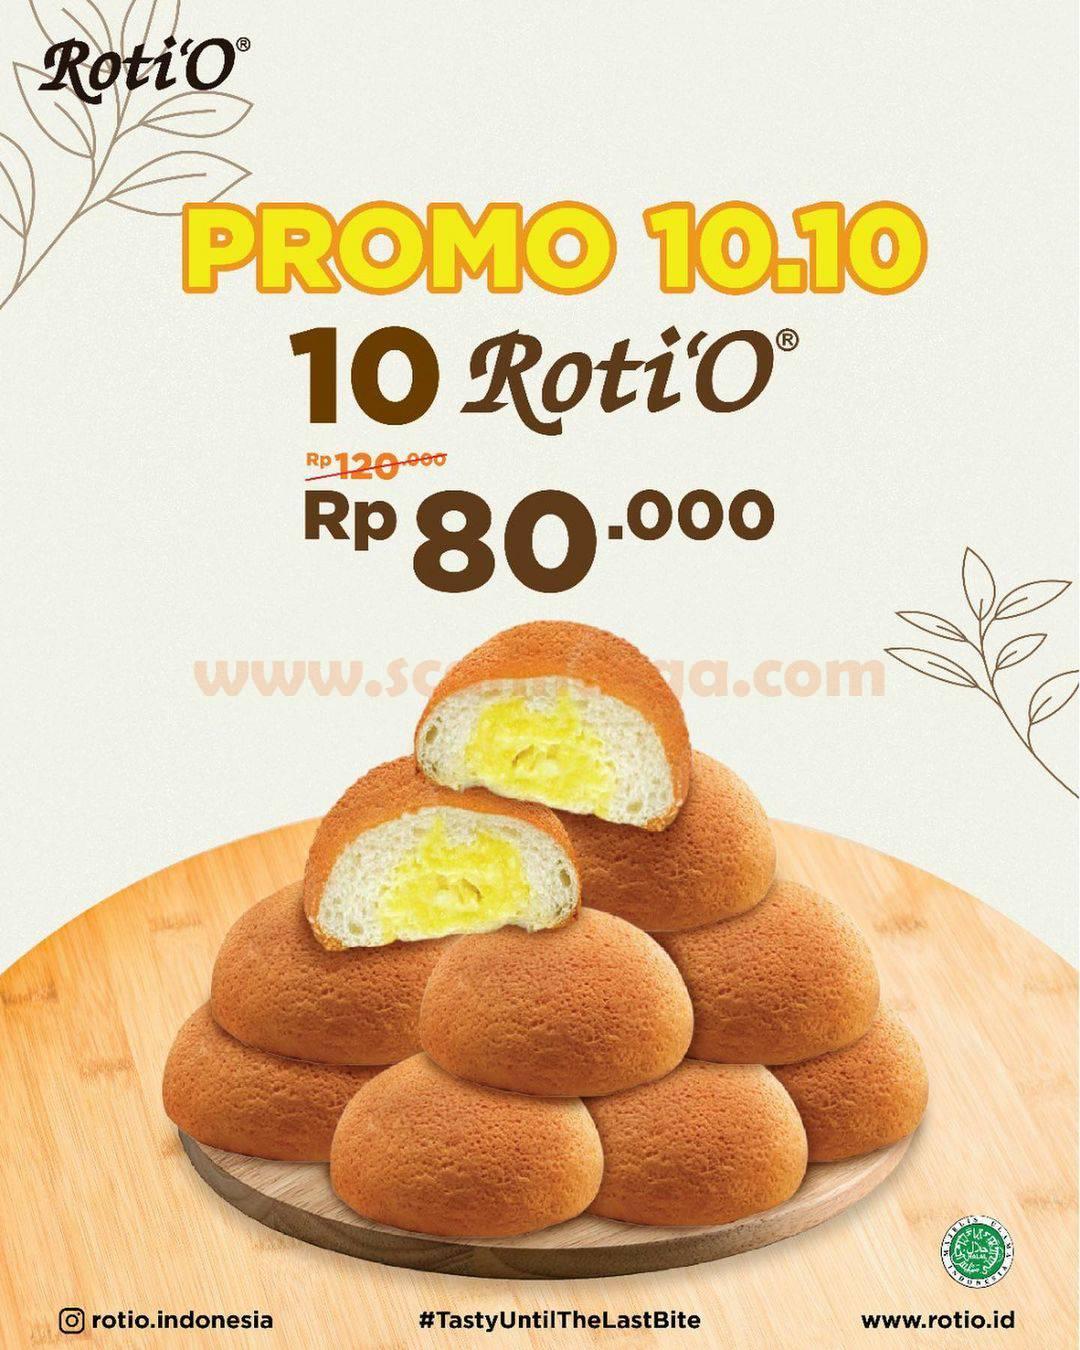 Promo Roti O Spesial 10.10 Beli 10 Roti'O Cuma Rp. 80.000